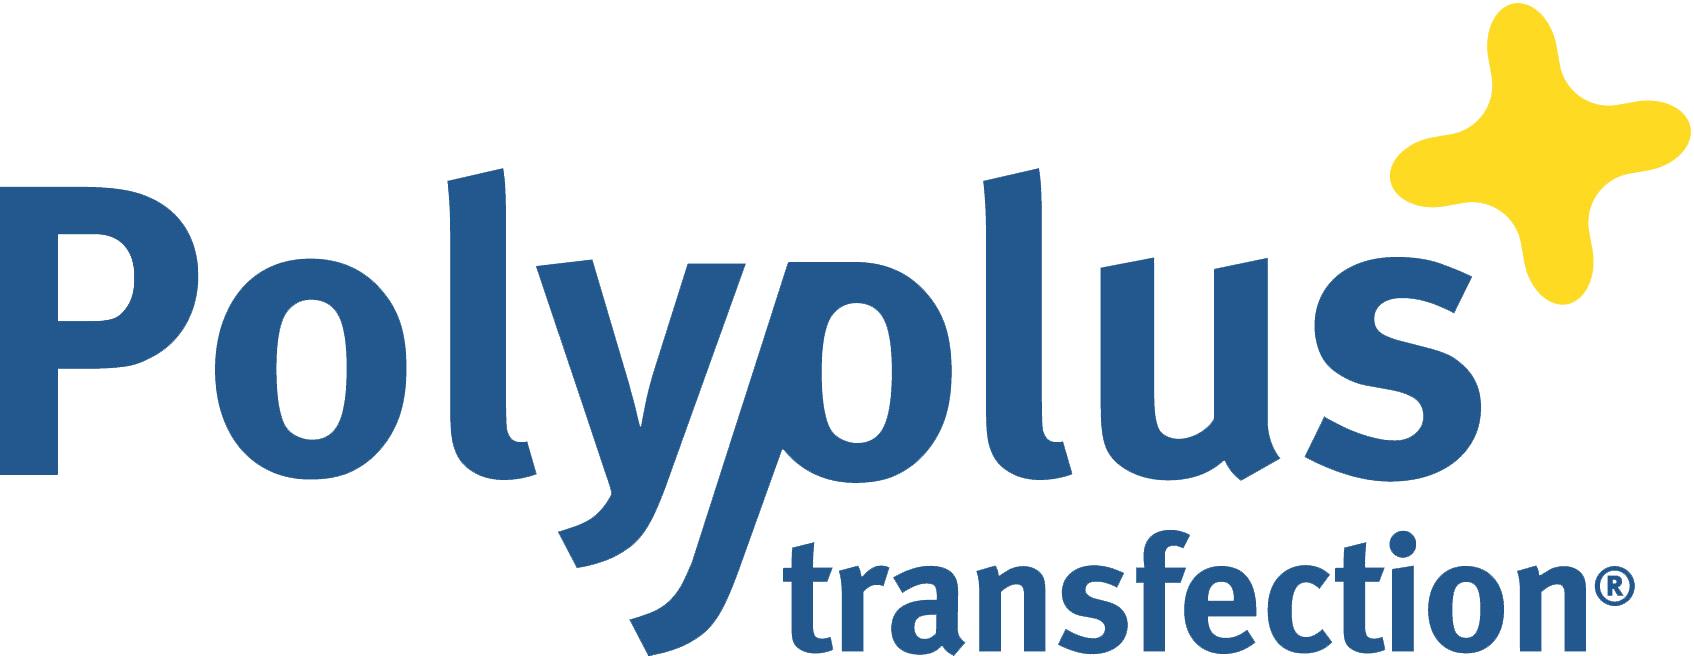 POLYPLUS-TRANSFECTION-LOGO-PNG